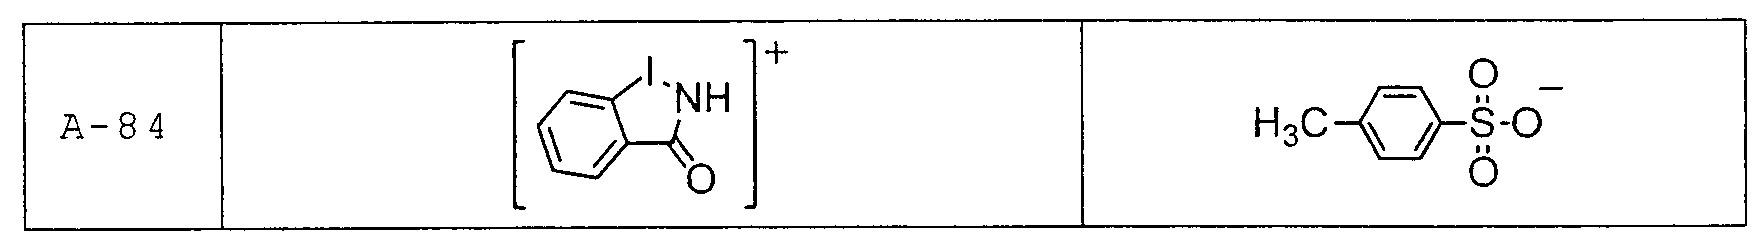 Figure 112008039120793-PAT00021